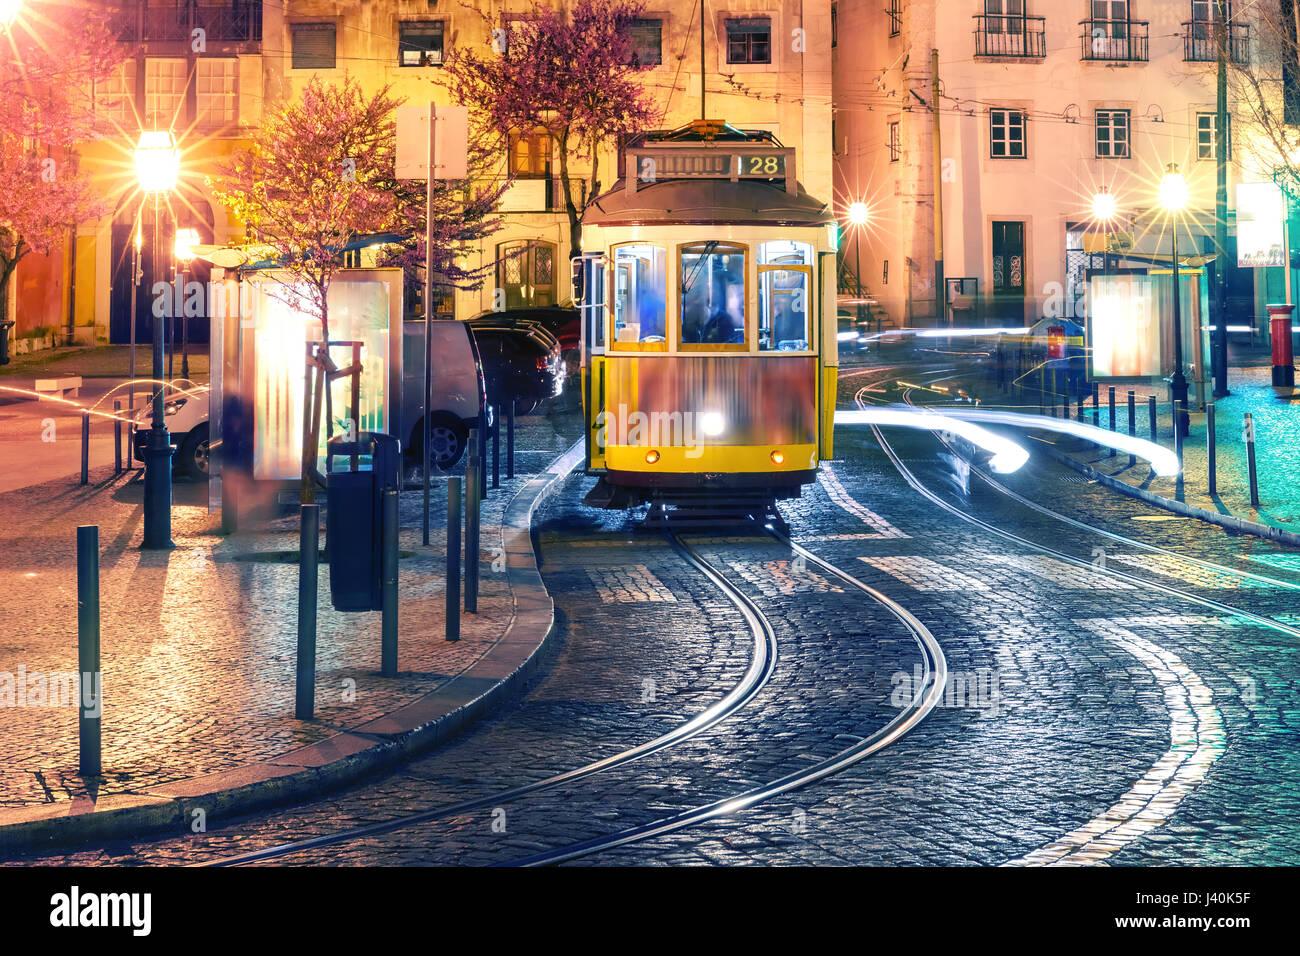 Yellow 28 tram in Alfama at night, Lisbon, Portugal - Stock Image